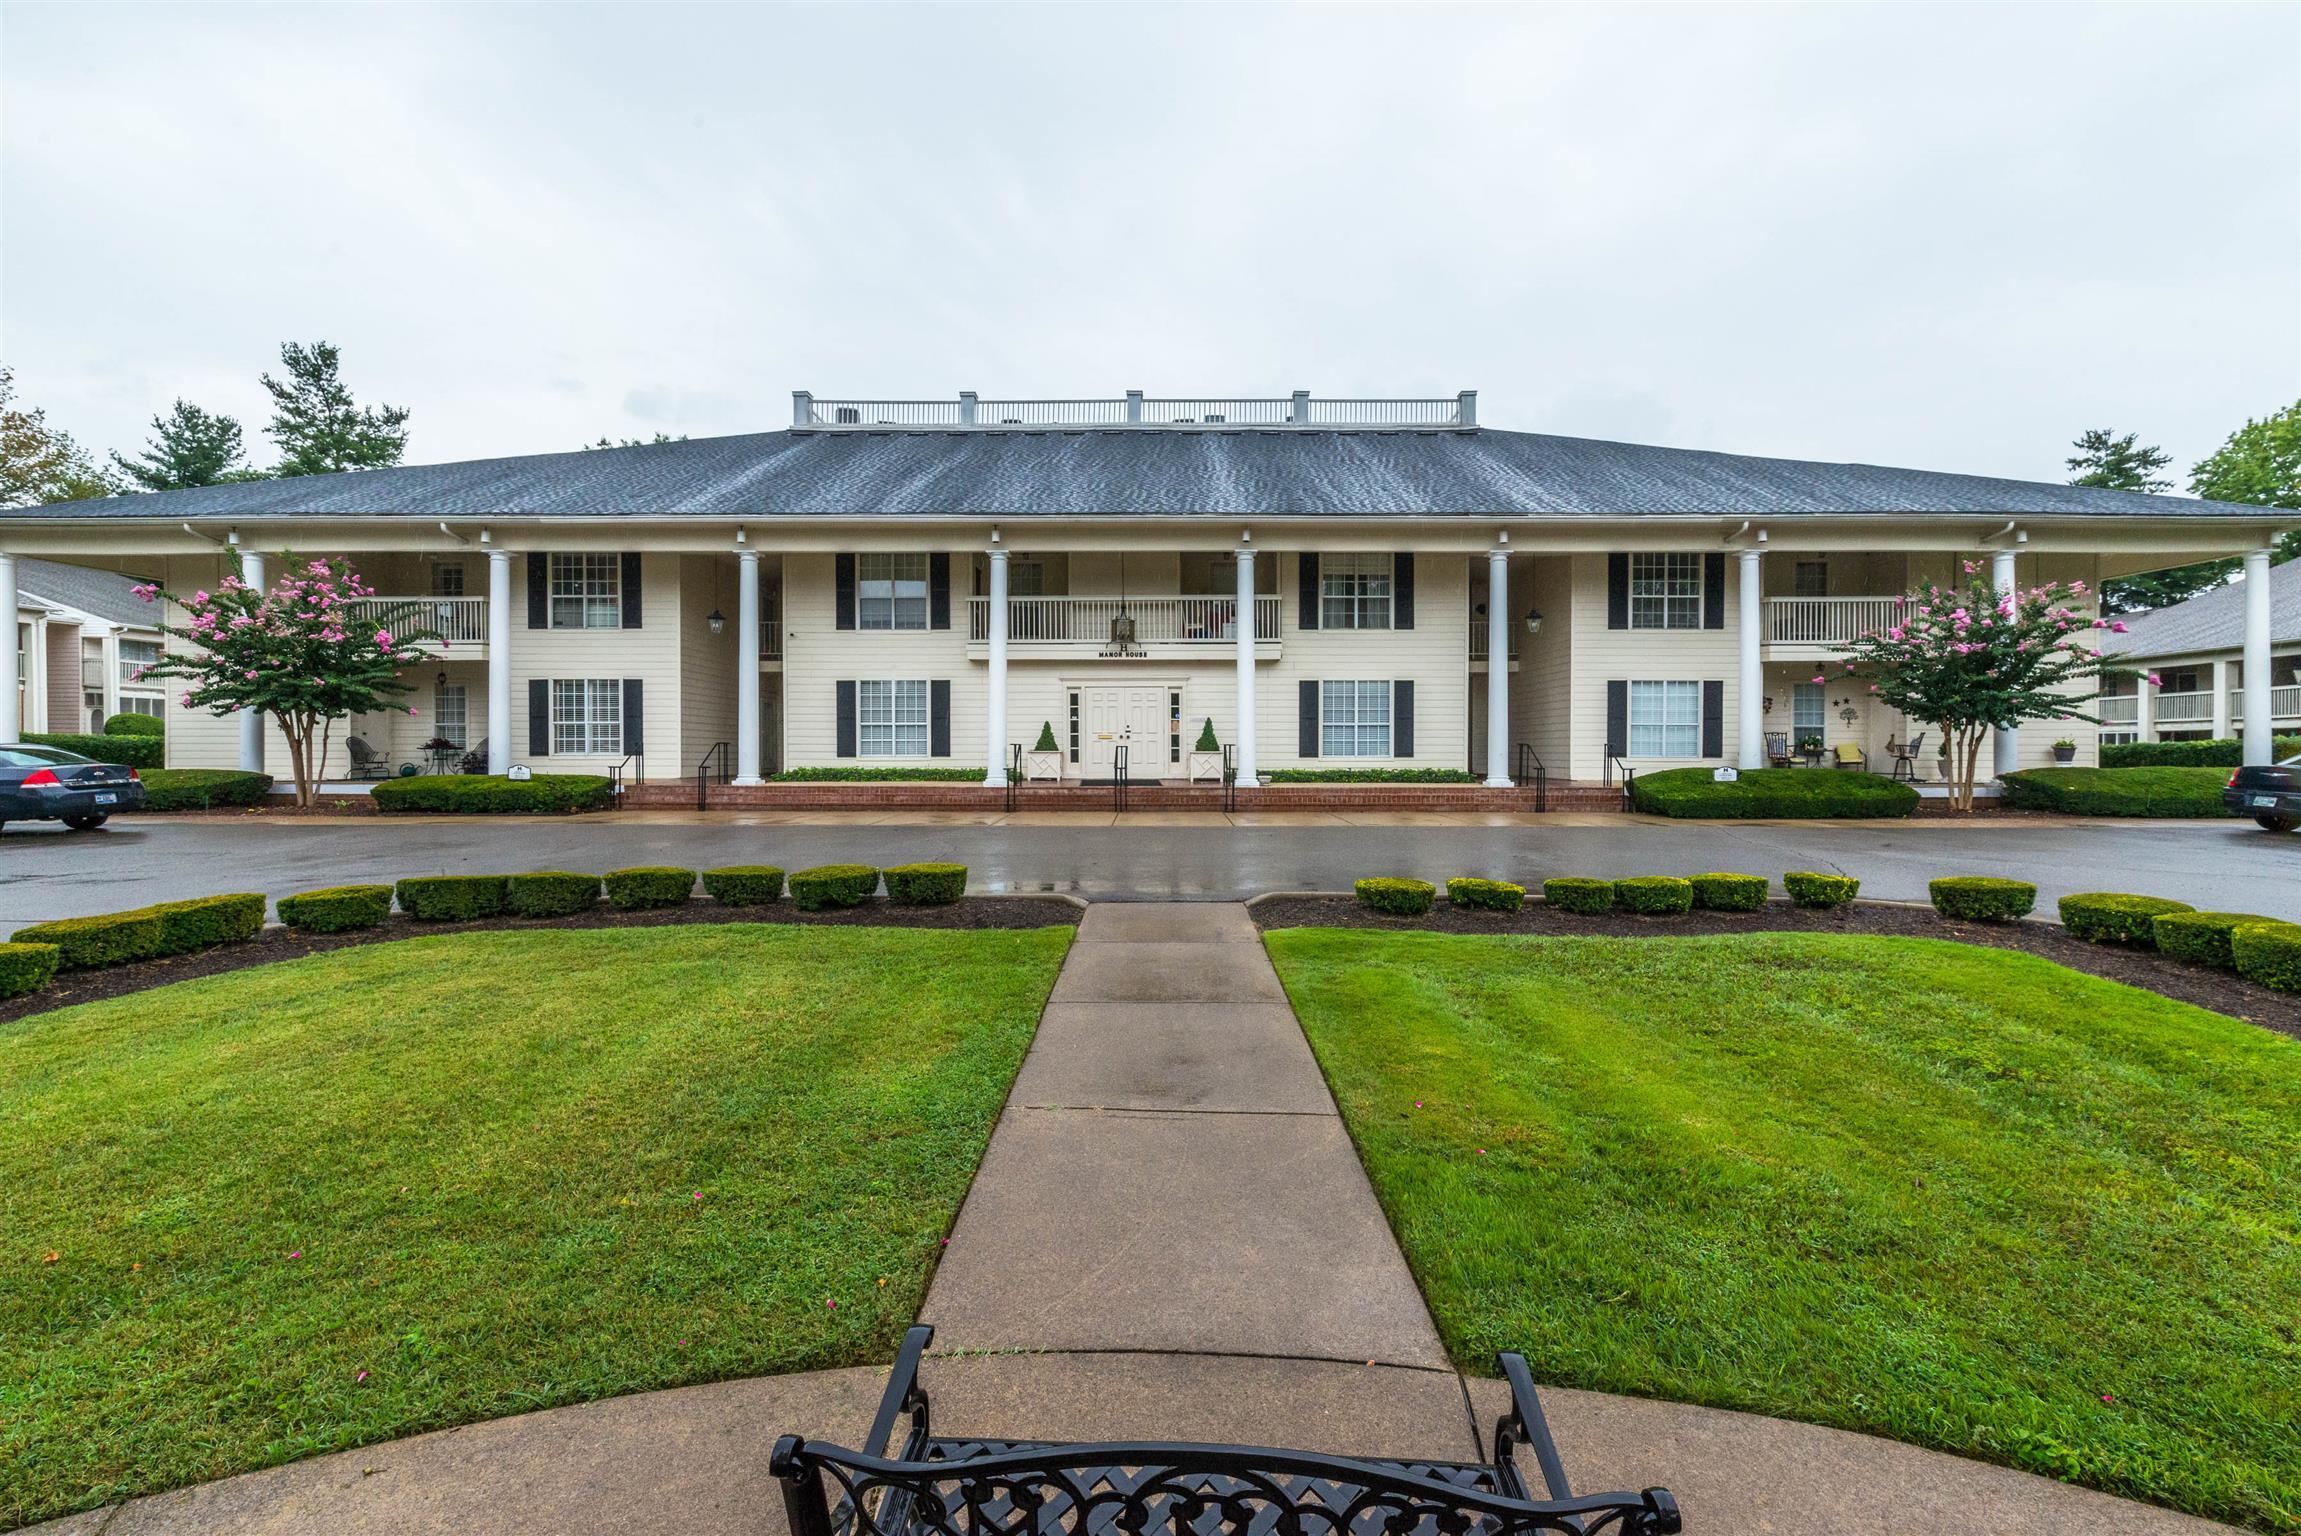 Photo of 1280 Middle Tennessee Blvd  Murfreesboro  TN